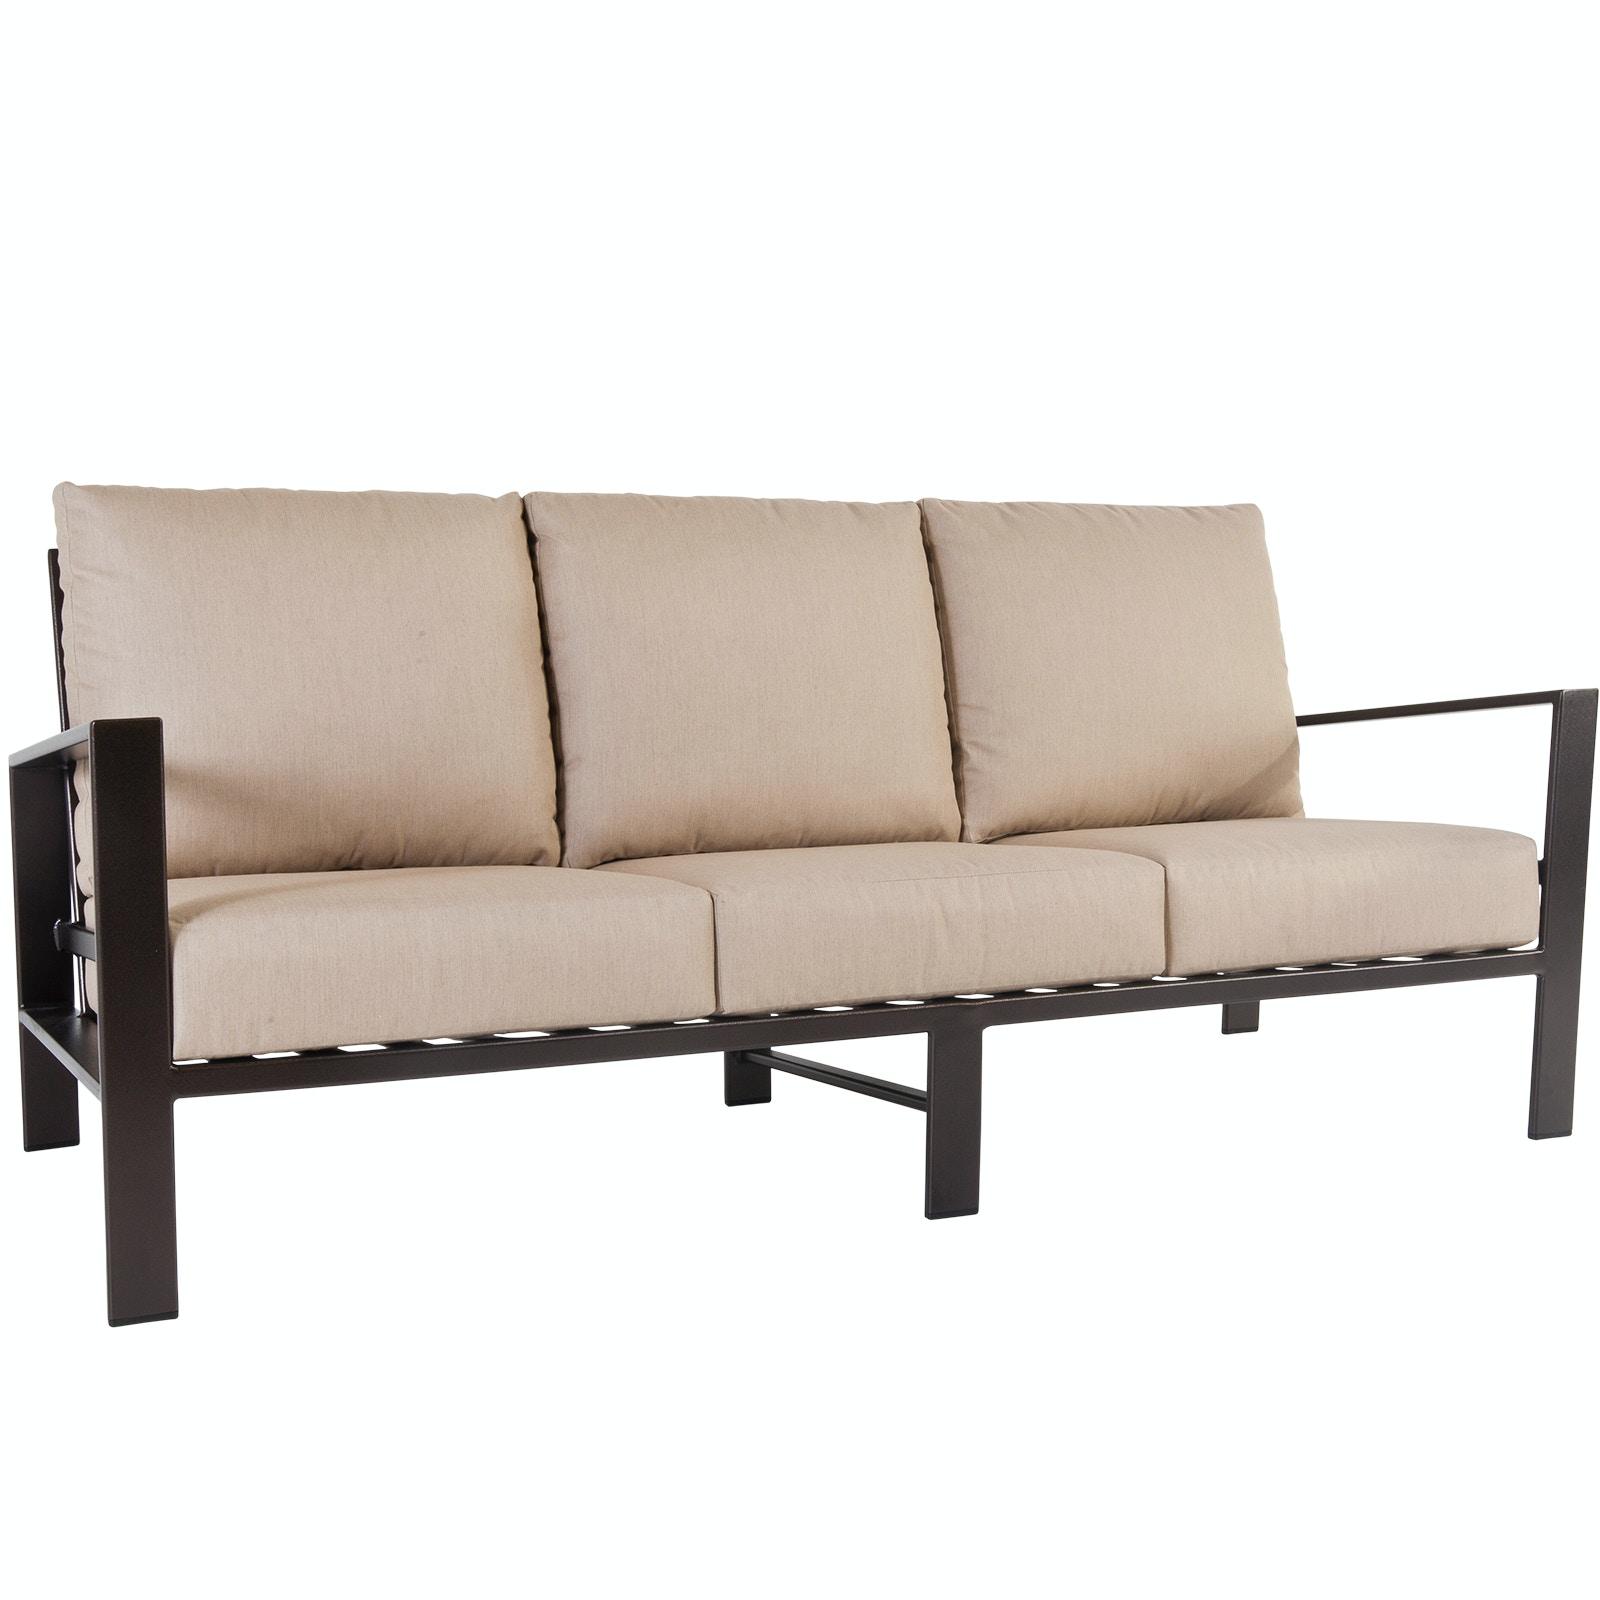 Merveilleux OW Lee Furniture Gios Sofa 4535 3S